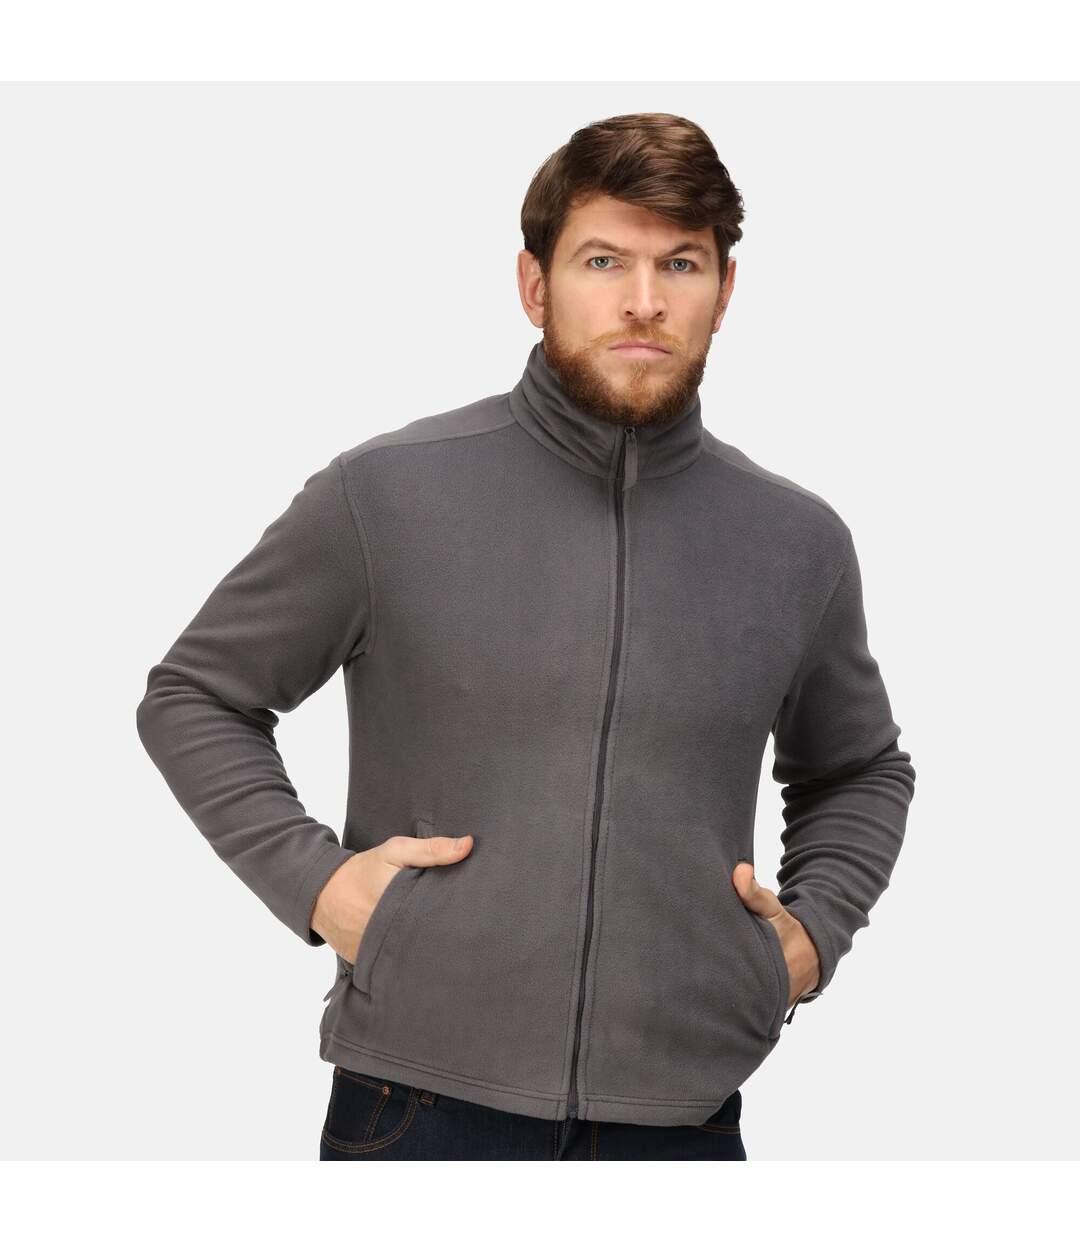 Regatta Mens Classic Microfleece Jacket (Seal Grey) - UTRG5202